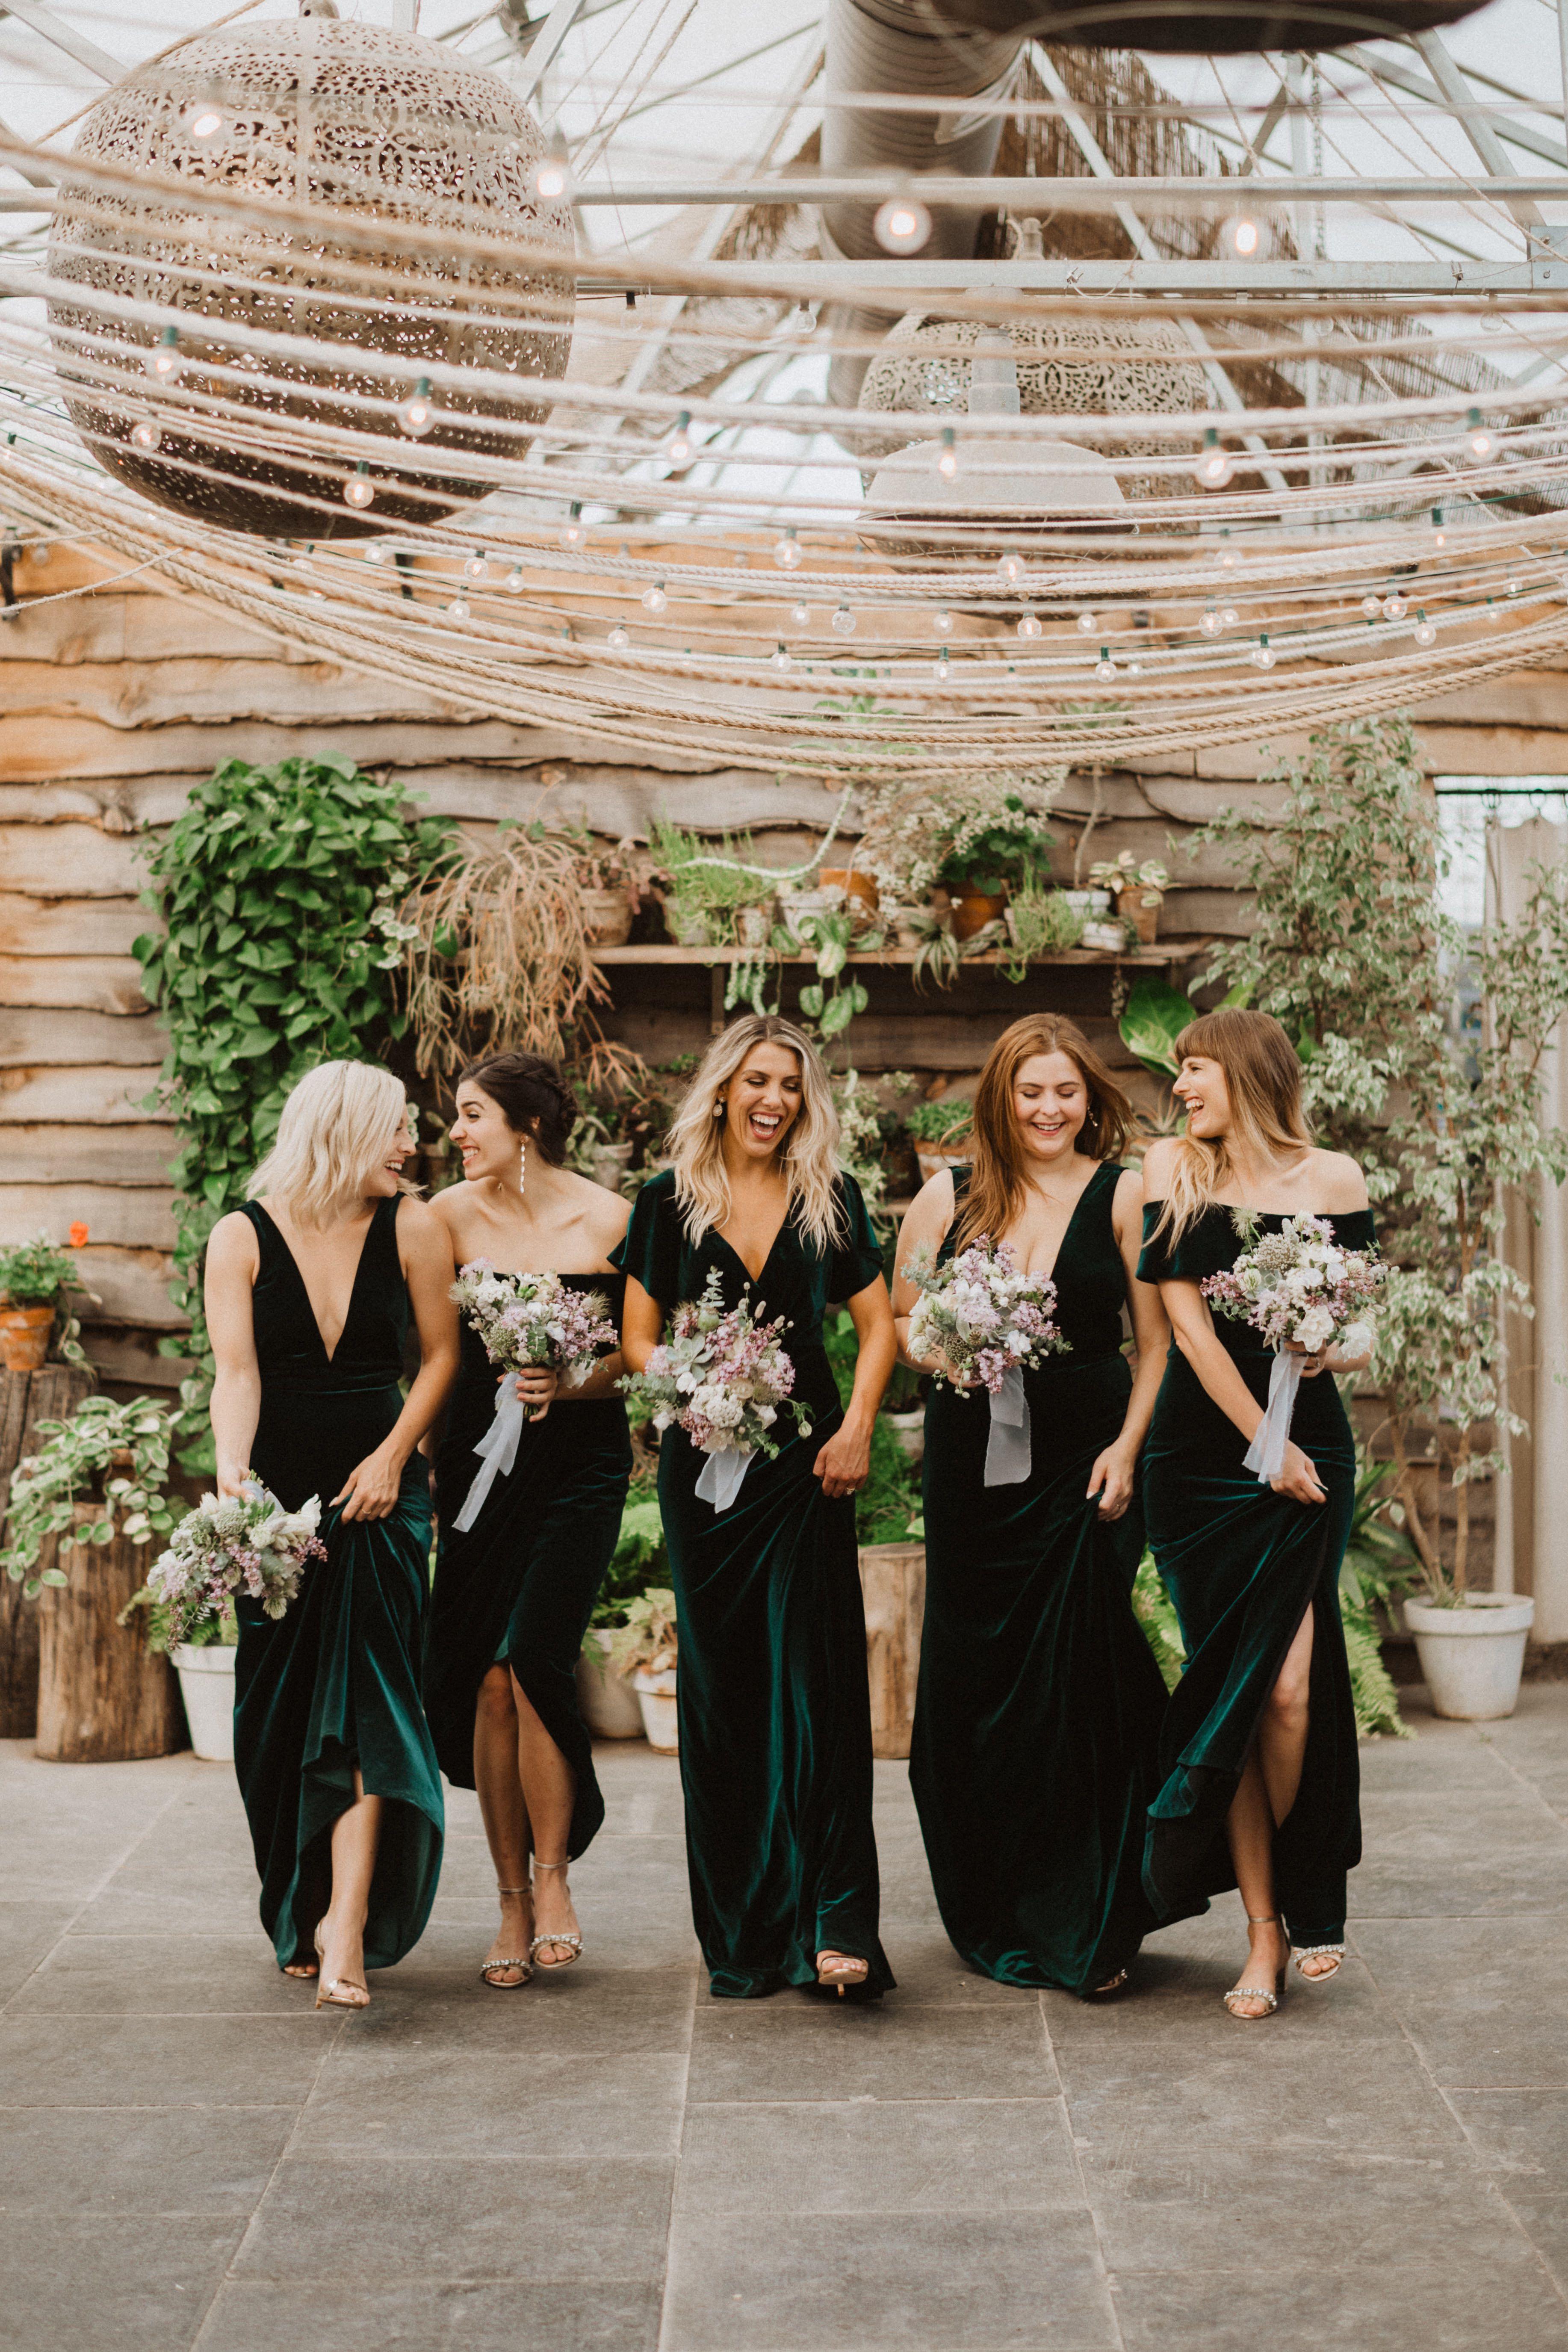 Photographer Patrobinsonphoto Maids Katerinaseigel Noelledowning Salt Emerald Green Bridesmaid Dresses Forest Green Bridesmaid Dresses Winter Bridesmaids